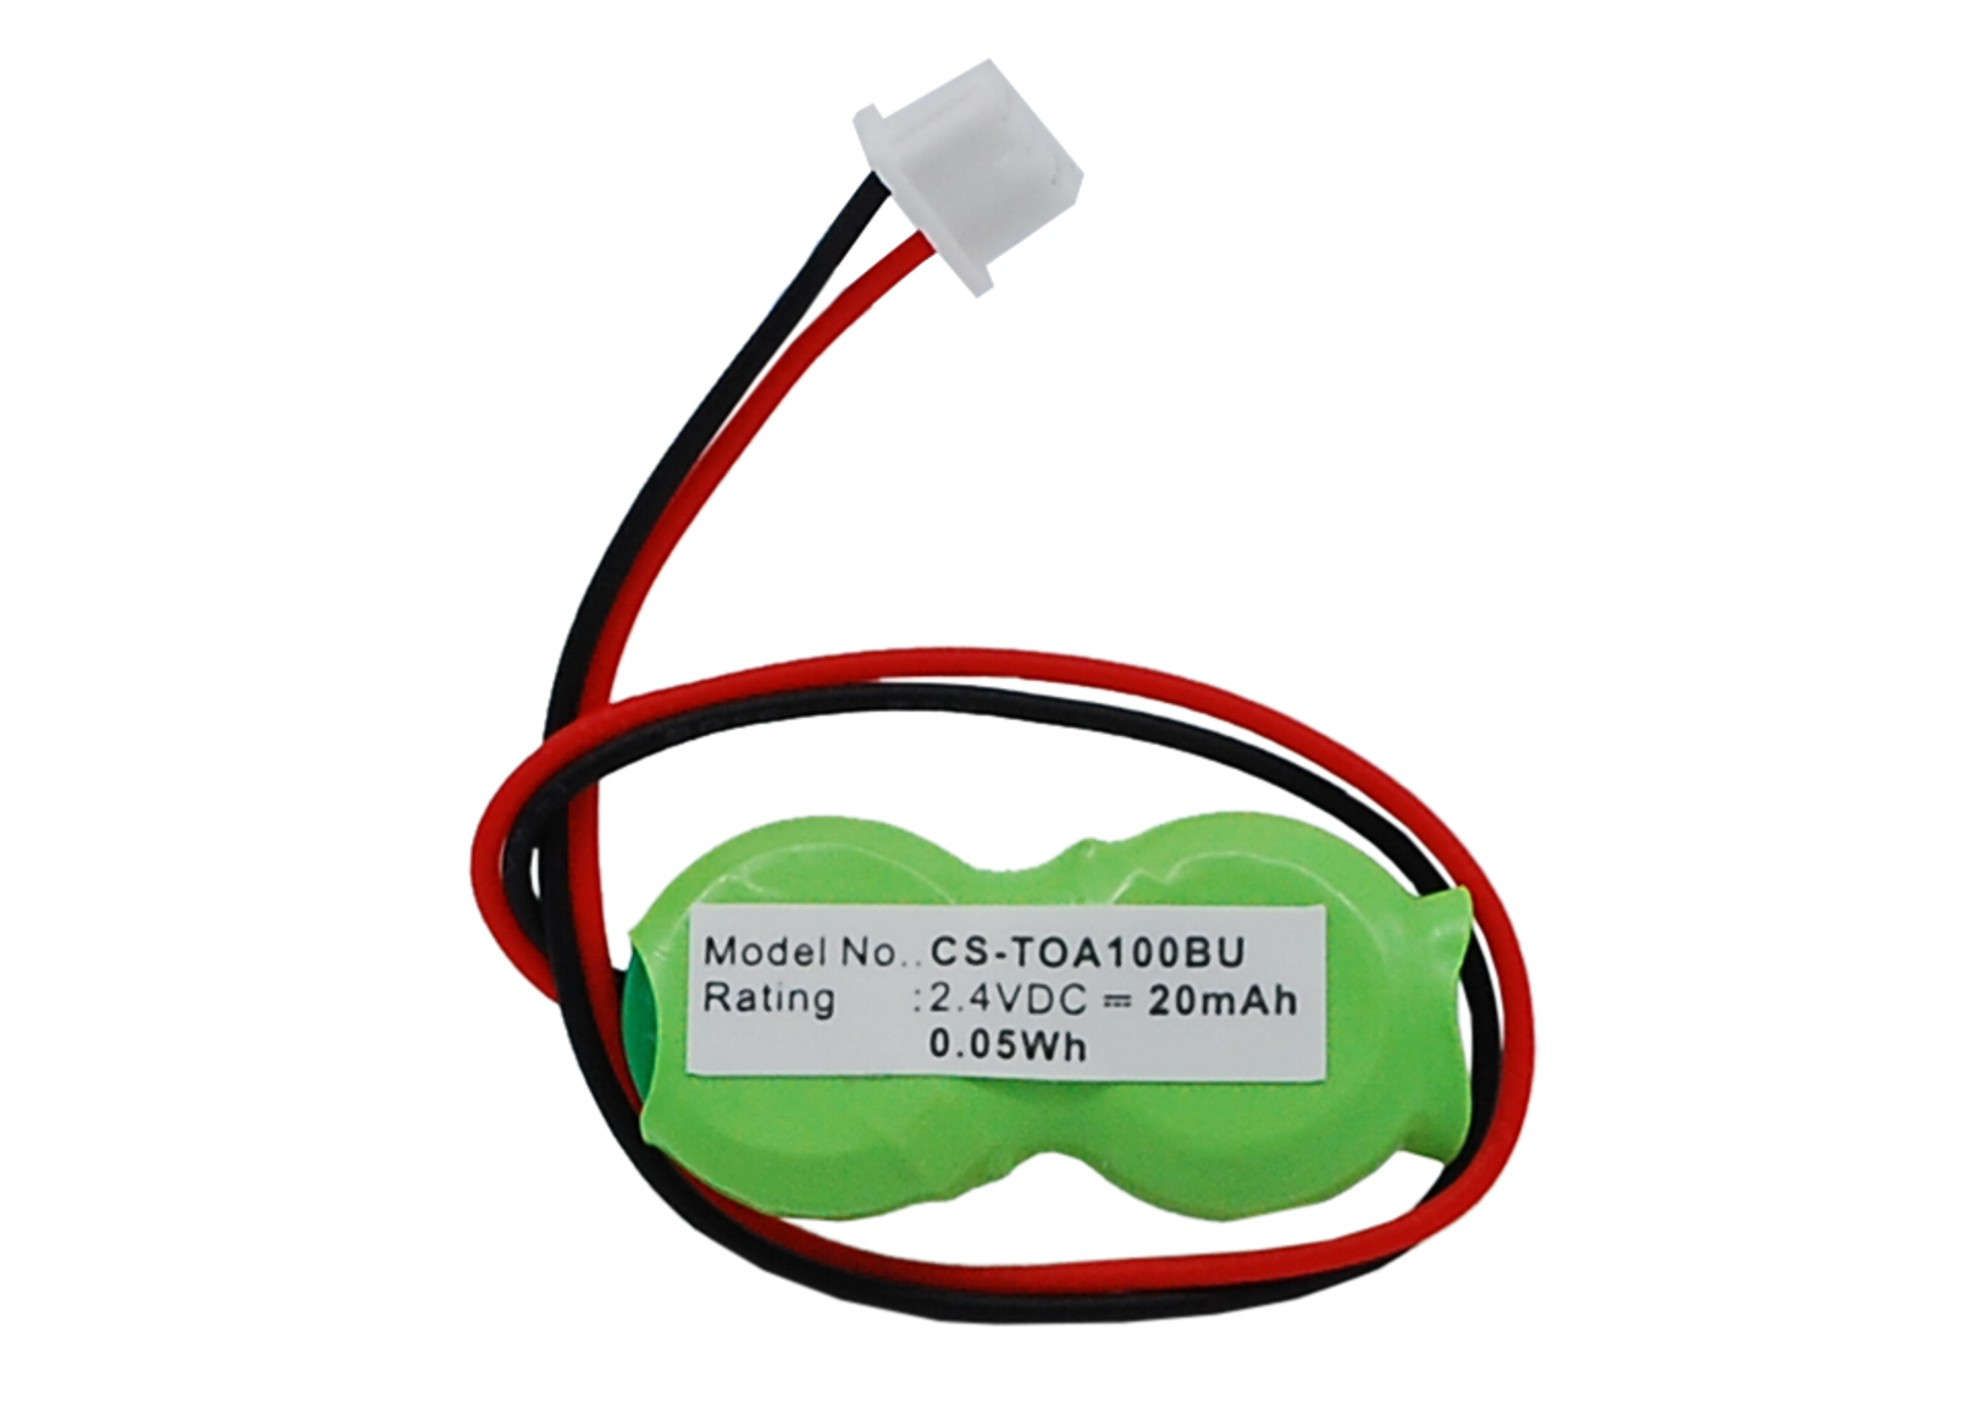 Cameron Sino baterie cmos pro TOSHIBA Tecra M9-S5515 2.4V Ni-MH 20mAh zelená - neoriginální